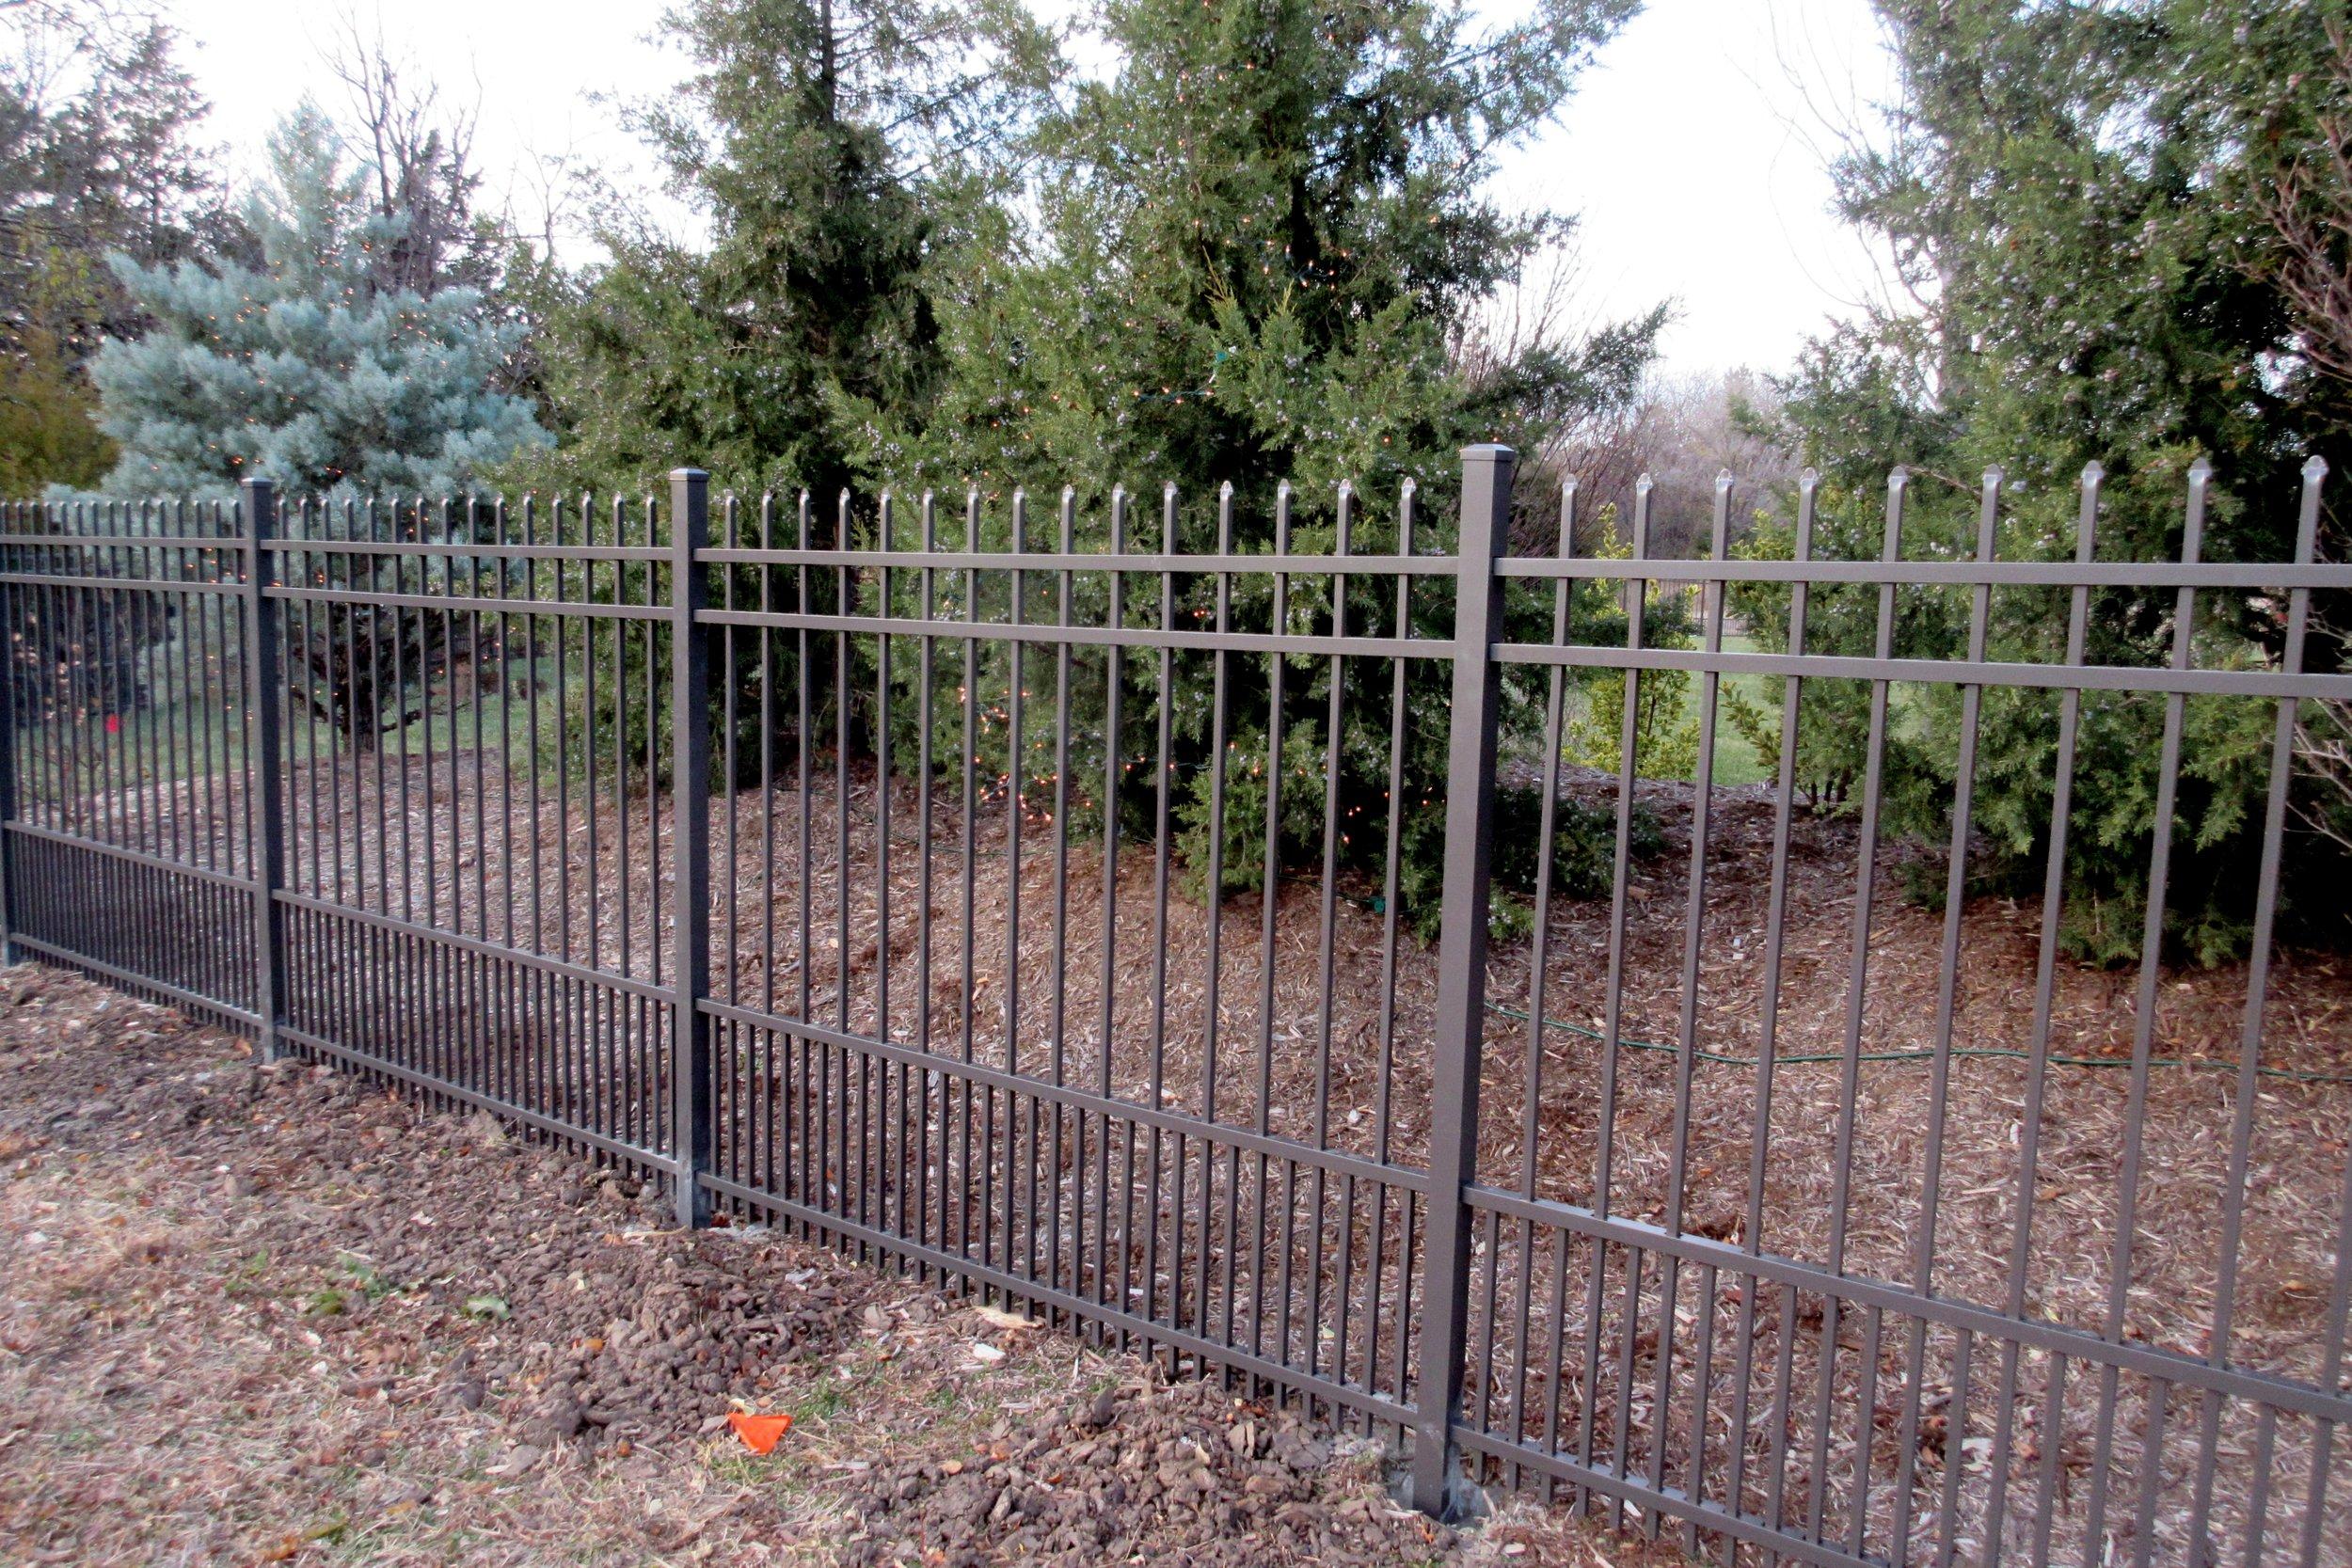 Residential-Ornamental-Fencing-Wichita-KS